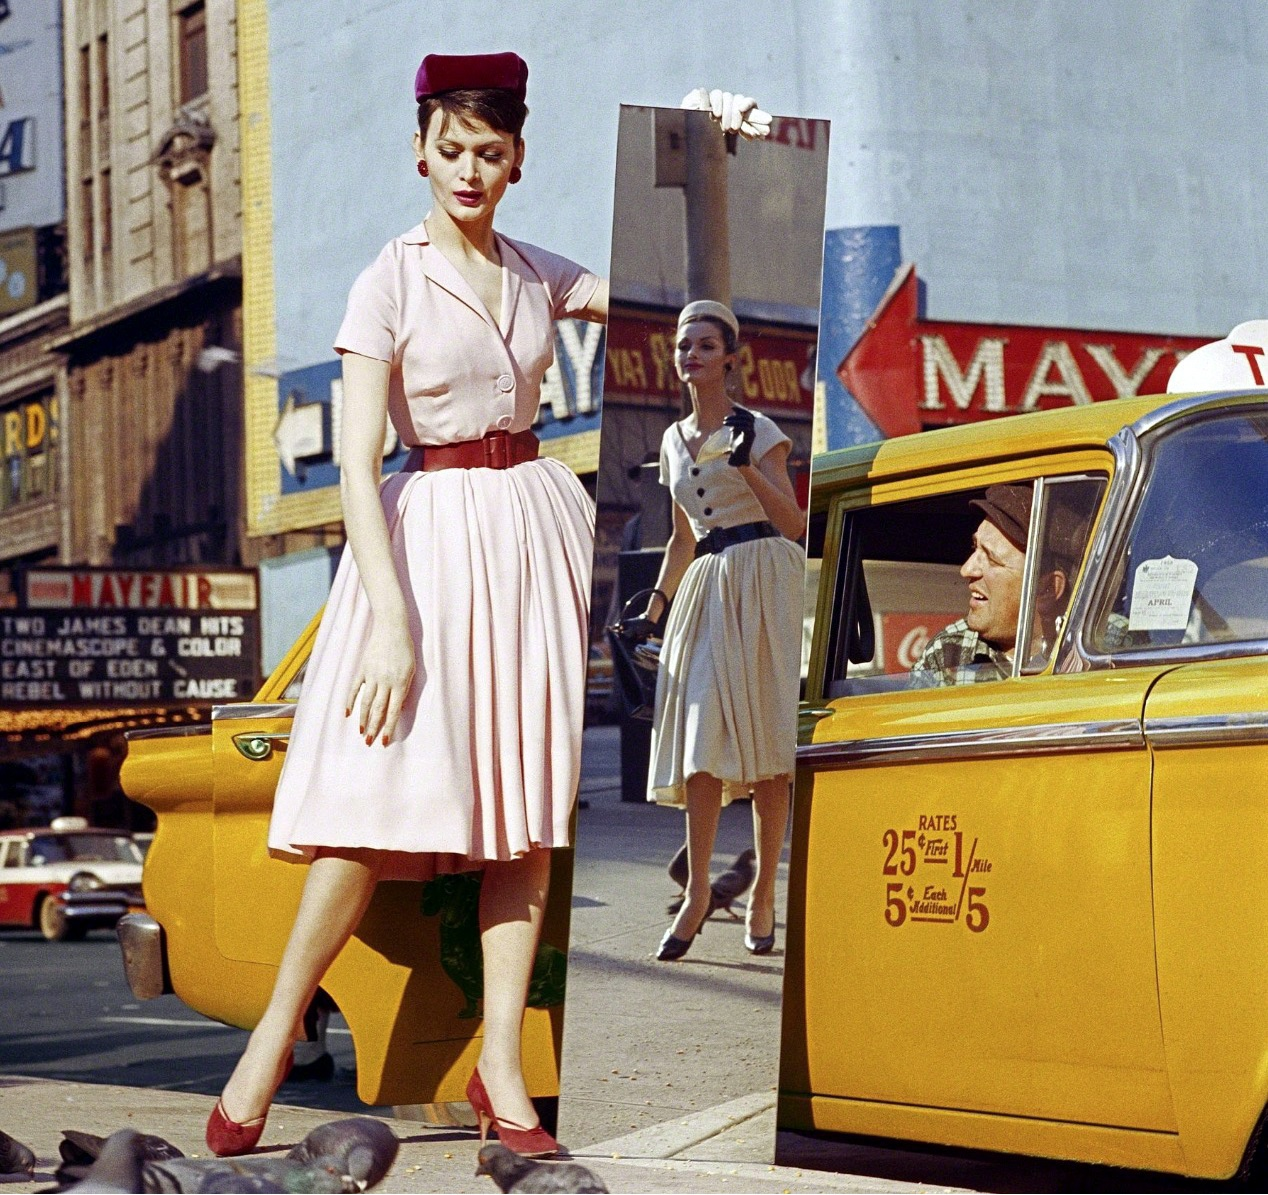 1959 NY Автор фото - Уильям Кляйн